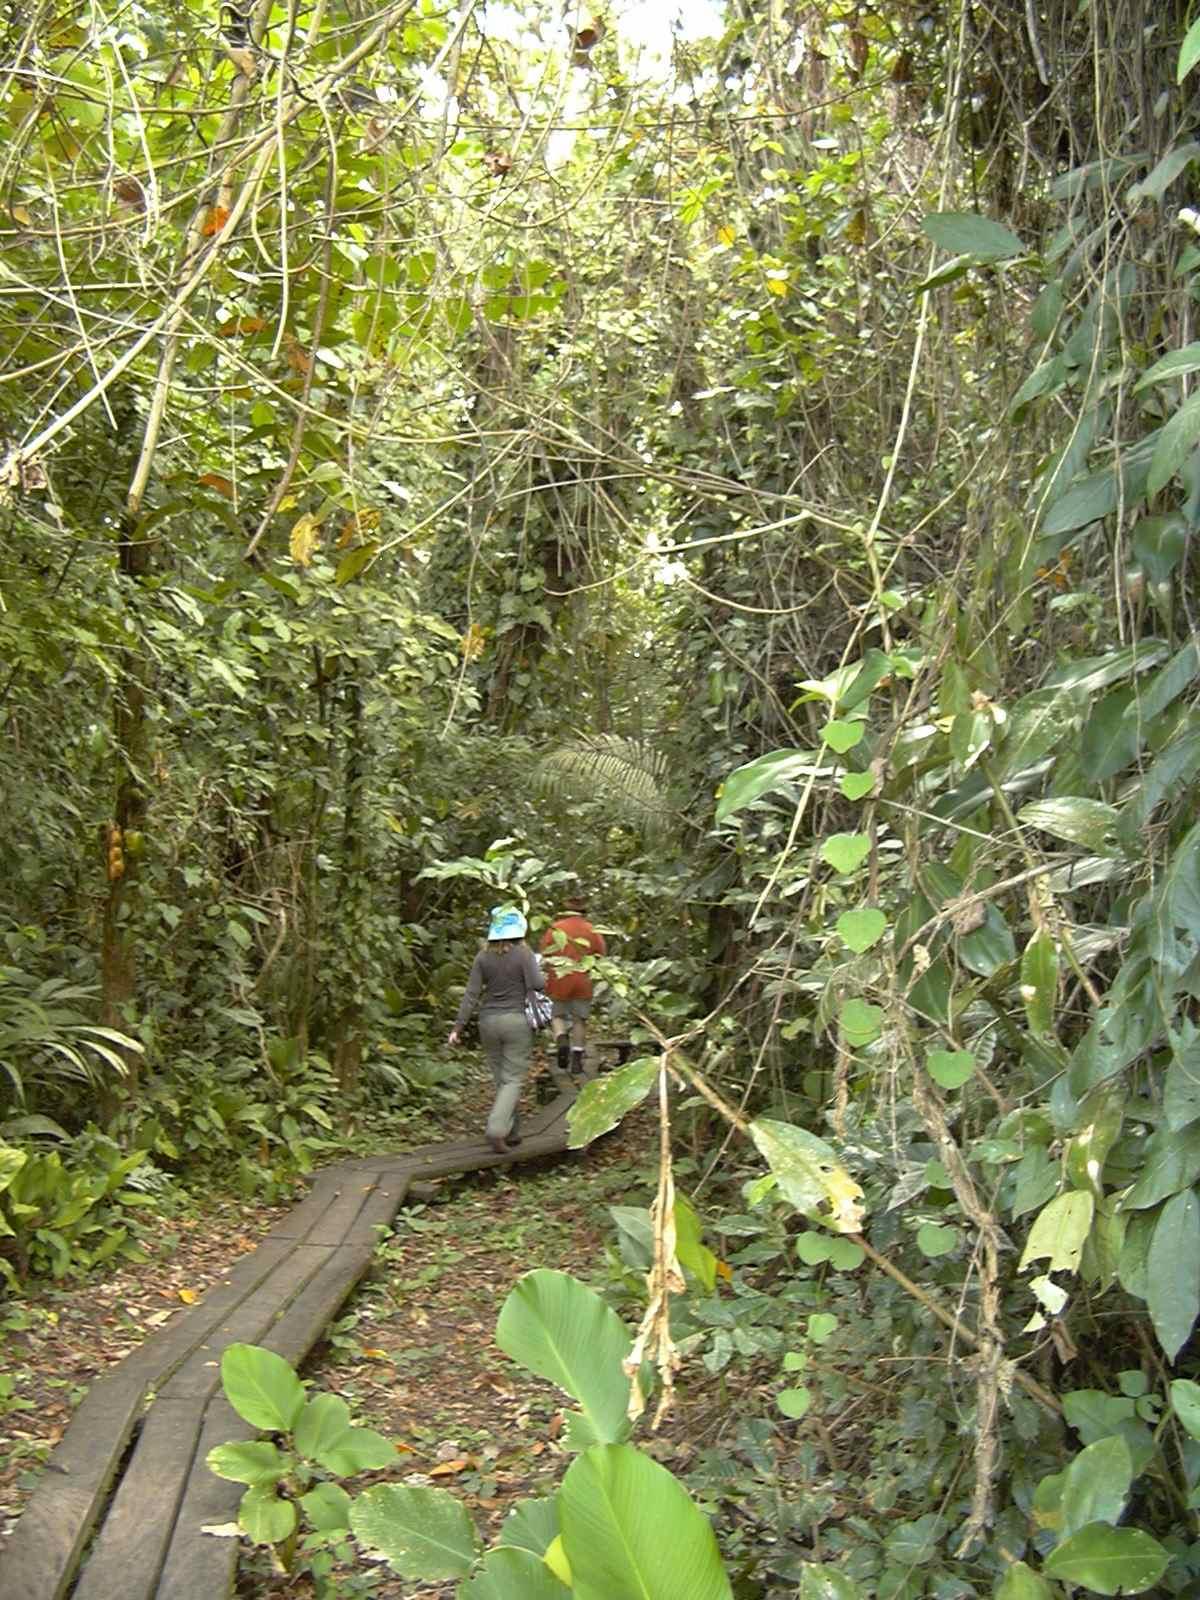 Lori and Mike walking thru the jungle P1000728 (2).jpg